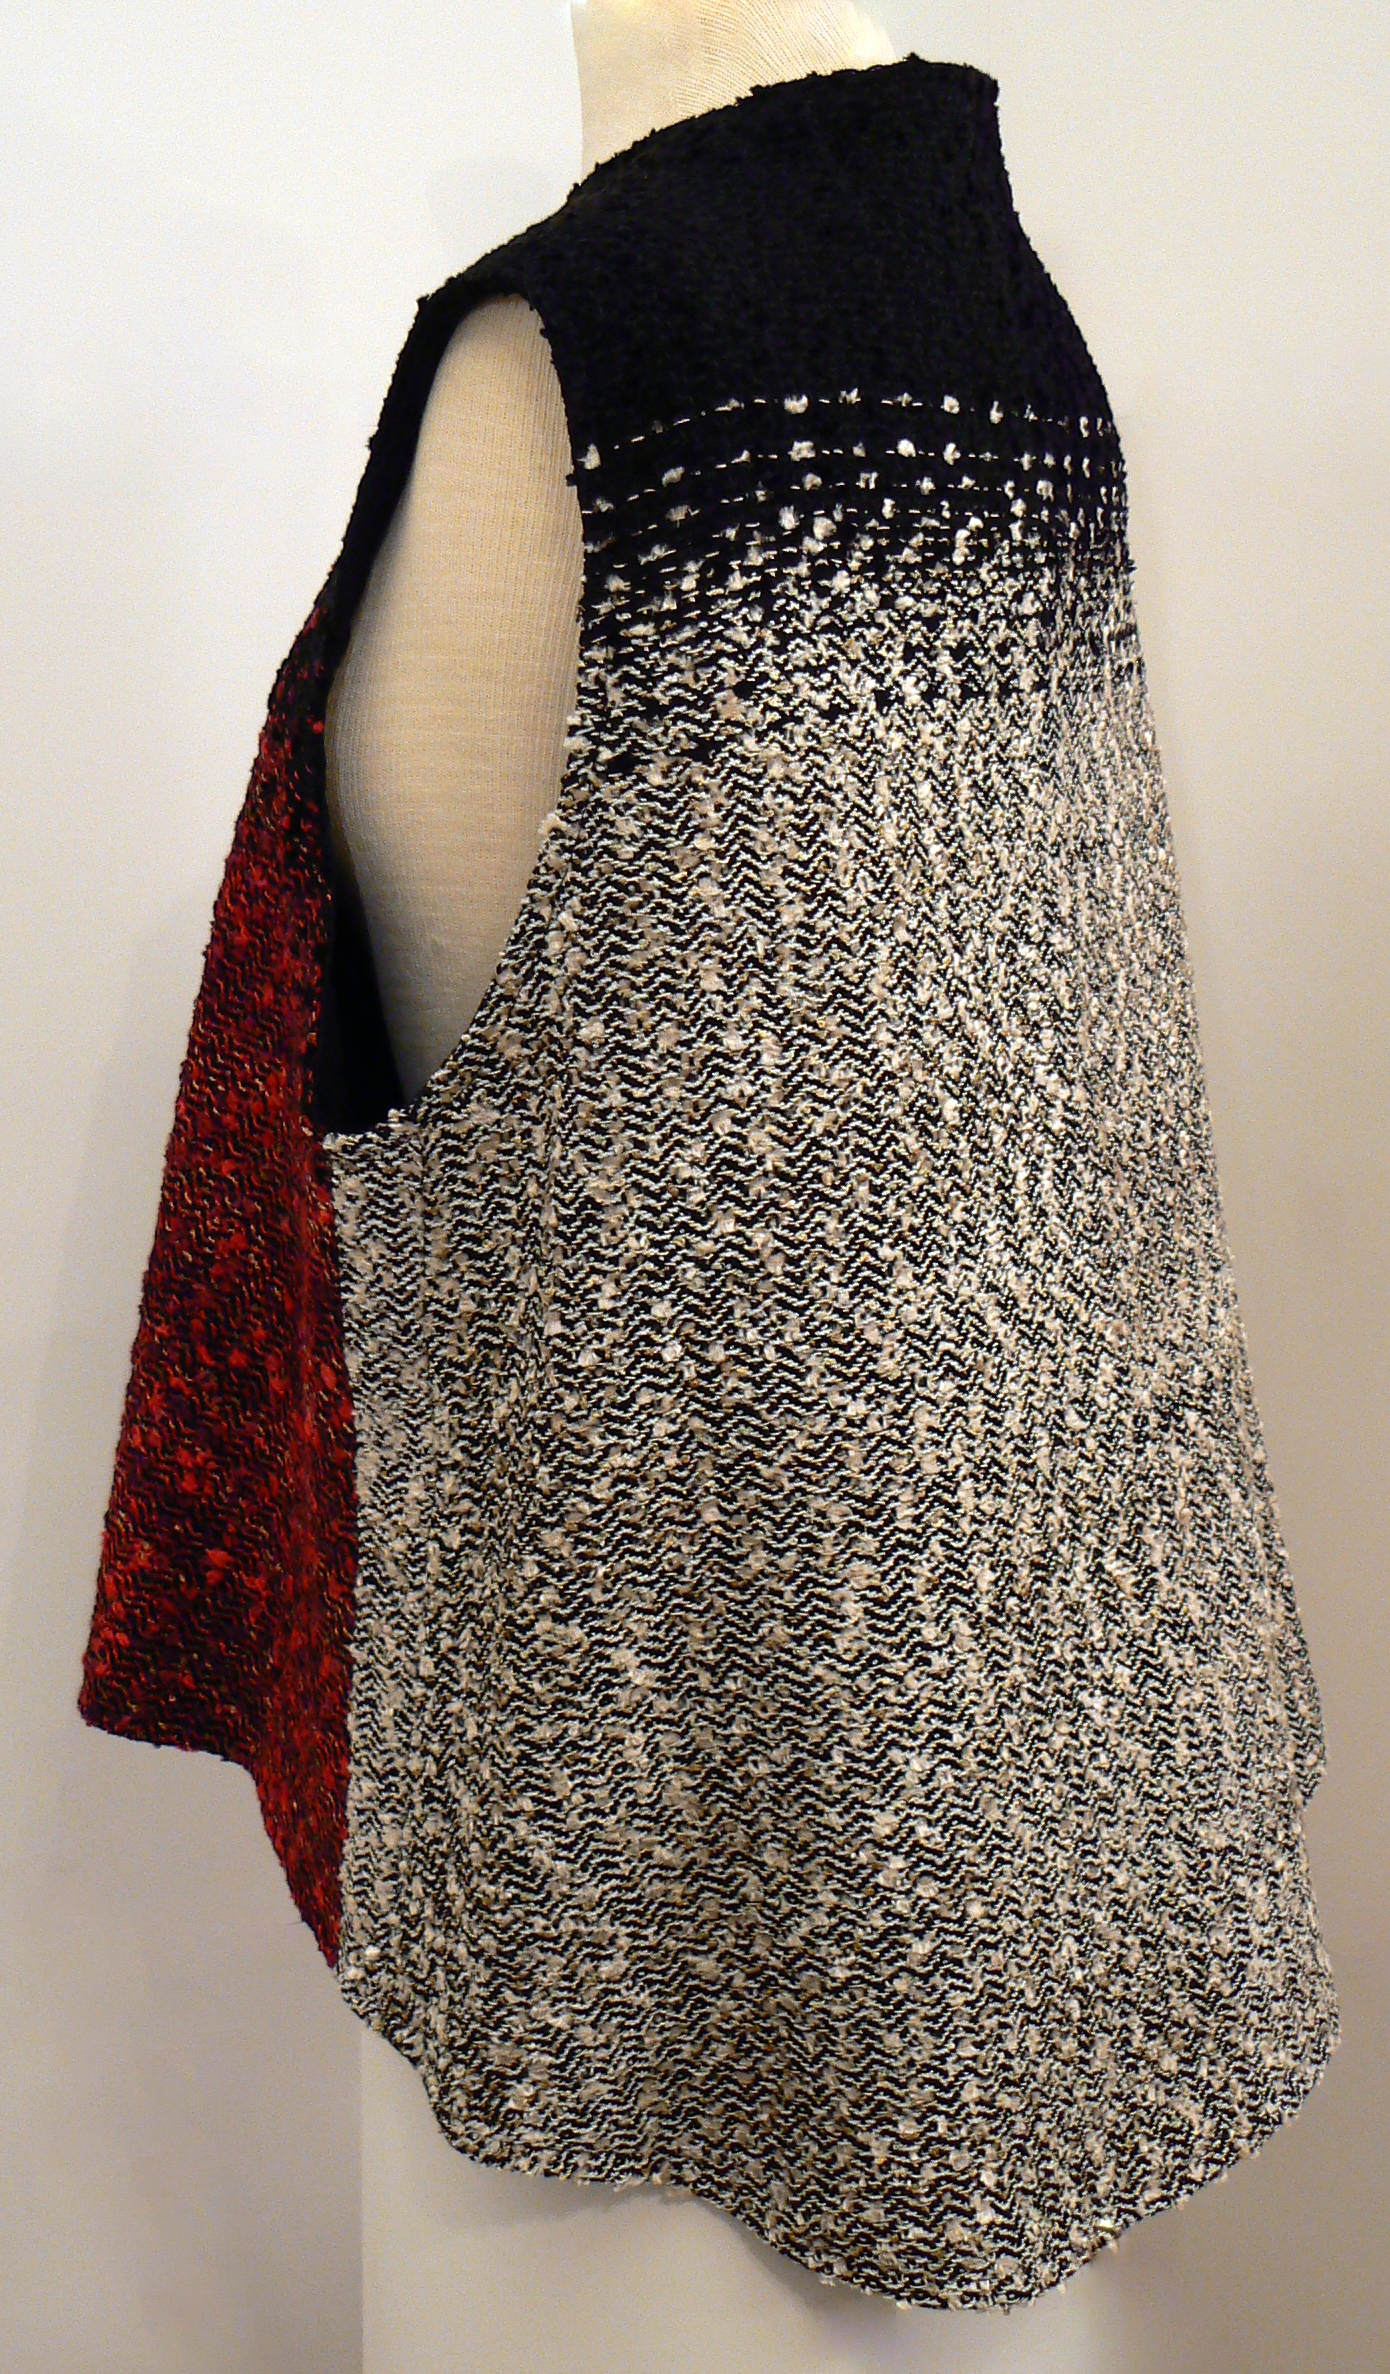 Handwoven Clothing, Vest, Kathleen Weir-West, 21-001.JPG